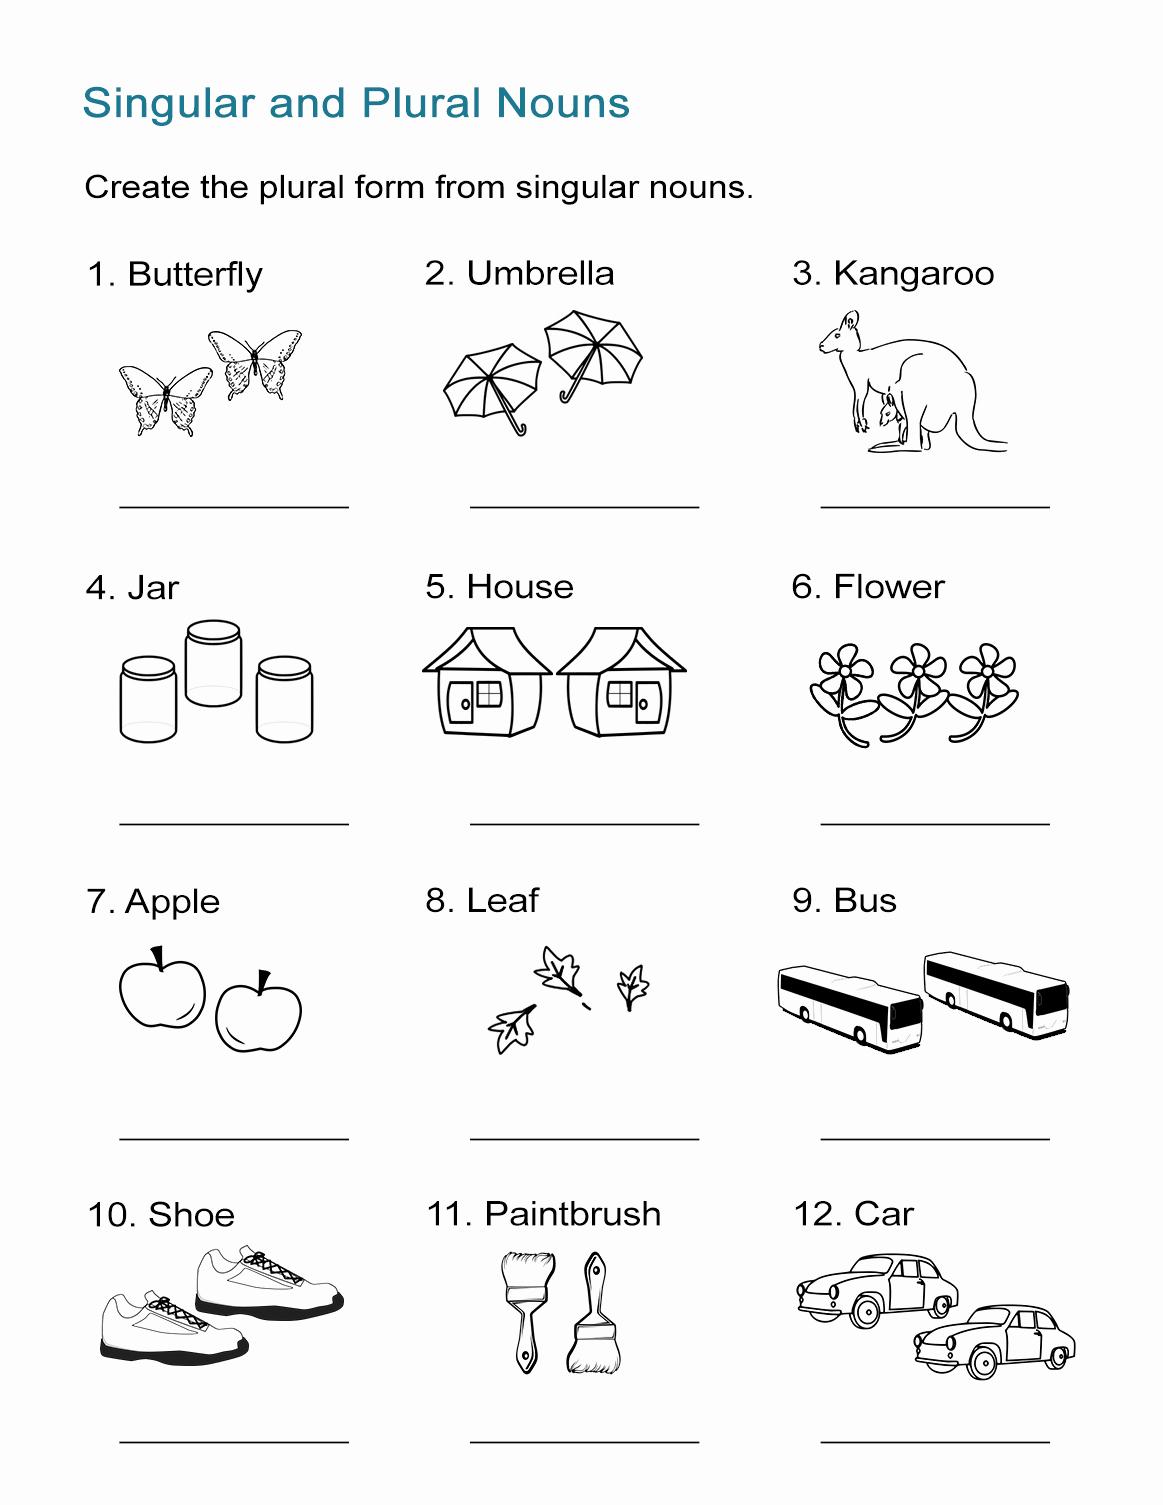 Singular and Plural Nouns Worksheet Awesome Singular and Plural Nouns Worksheet All Esl